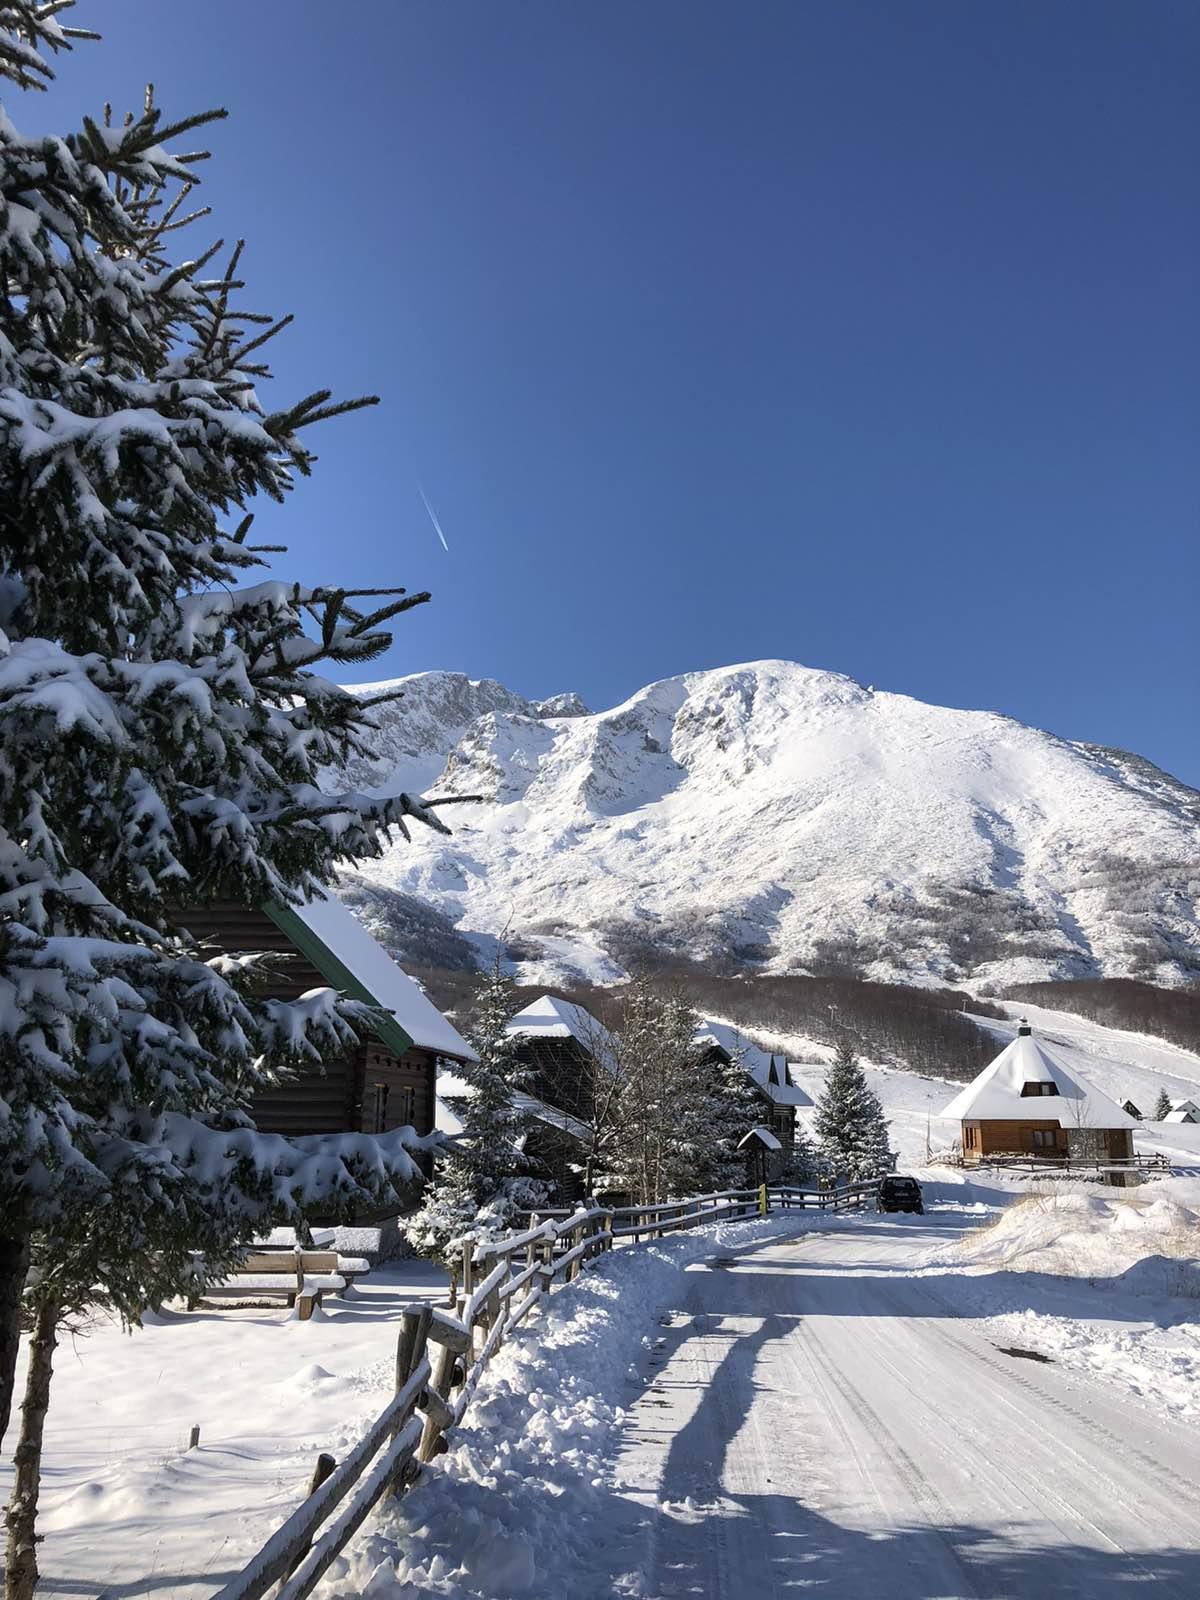 Durmitor pod snijegom (foto: Srđan Obradović)